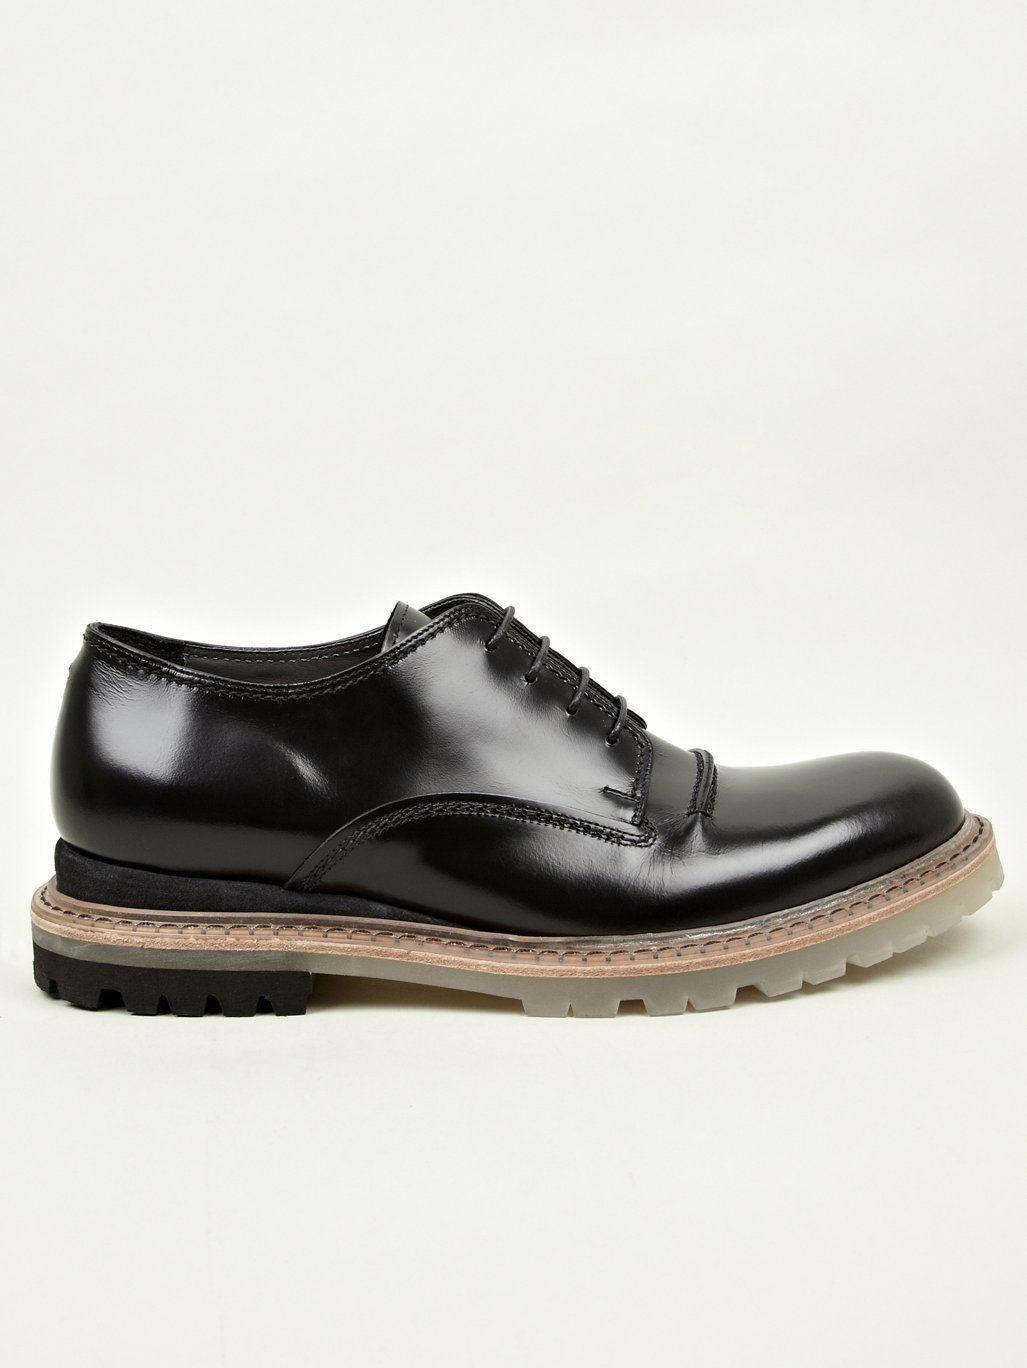 Lanvin Men S Black Leather Chunky Sole Derby Shoes Shoes Derby Shoes Leather Sole Shoes [ 1368 x 1027 Pixel ]